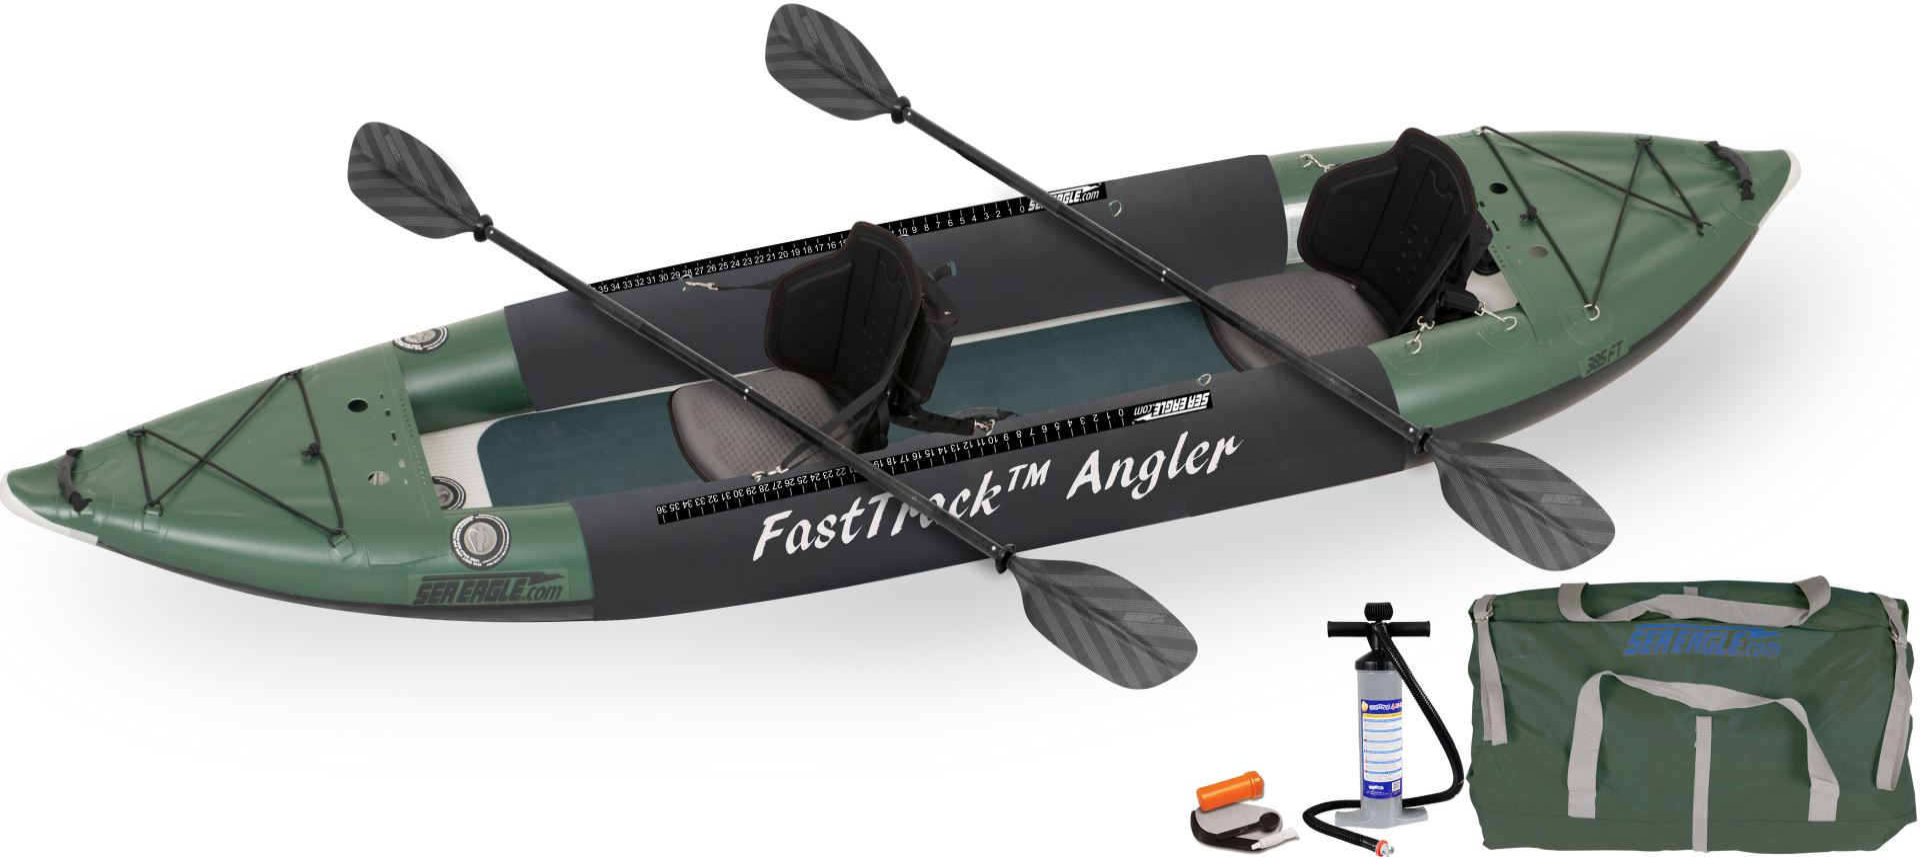 https://www.seaeagle.com/img/BoatPackage/XXL/385FTAK_P.jpg